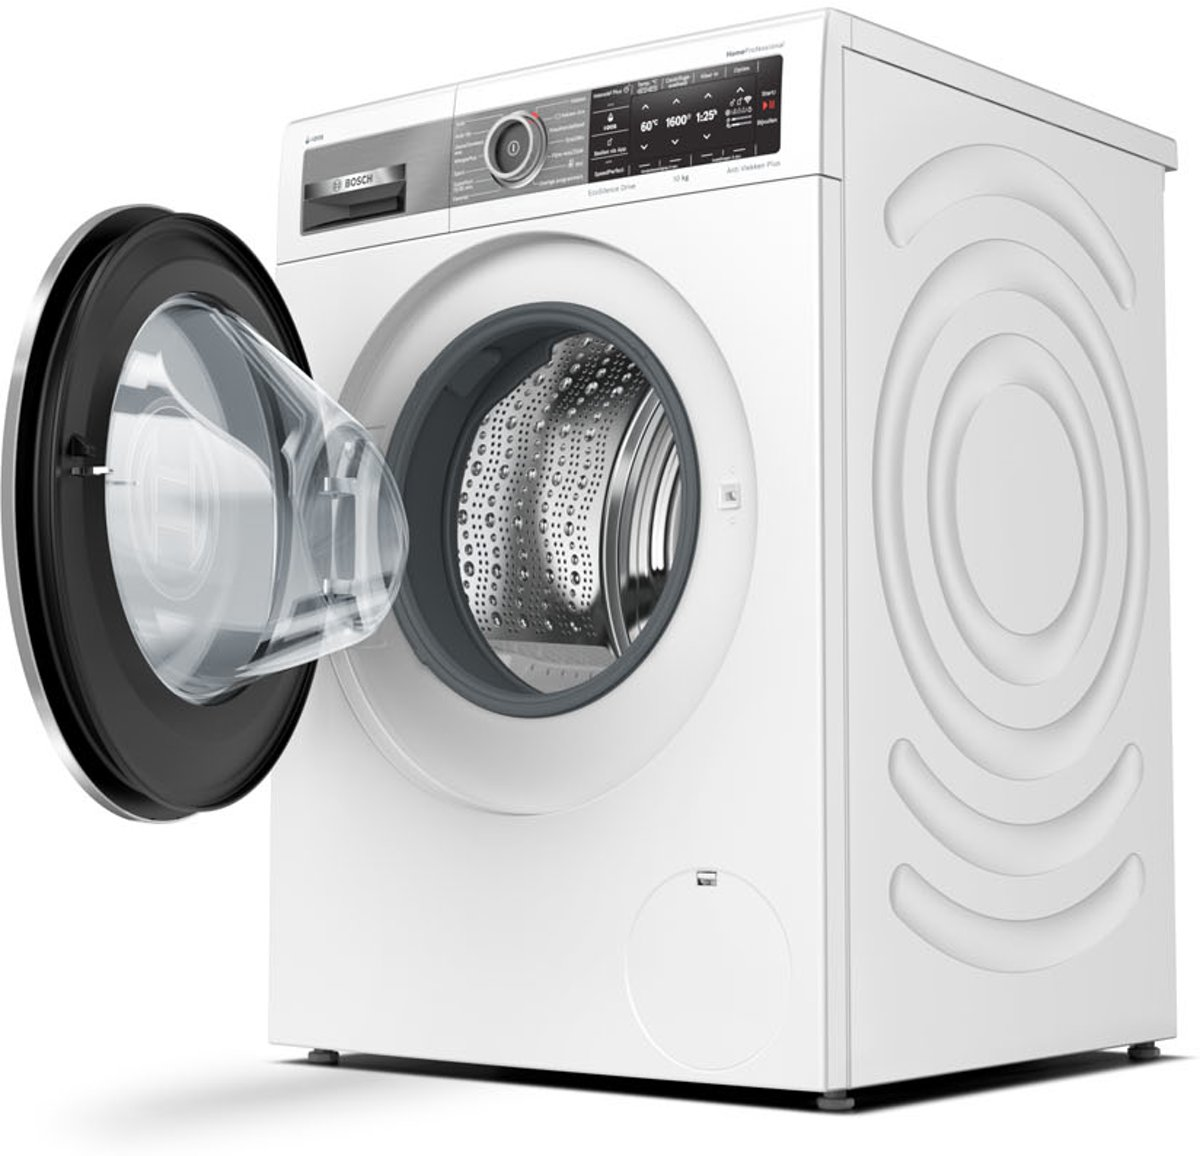 Bosch wasmachine WAXH2E70NL kopen